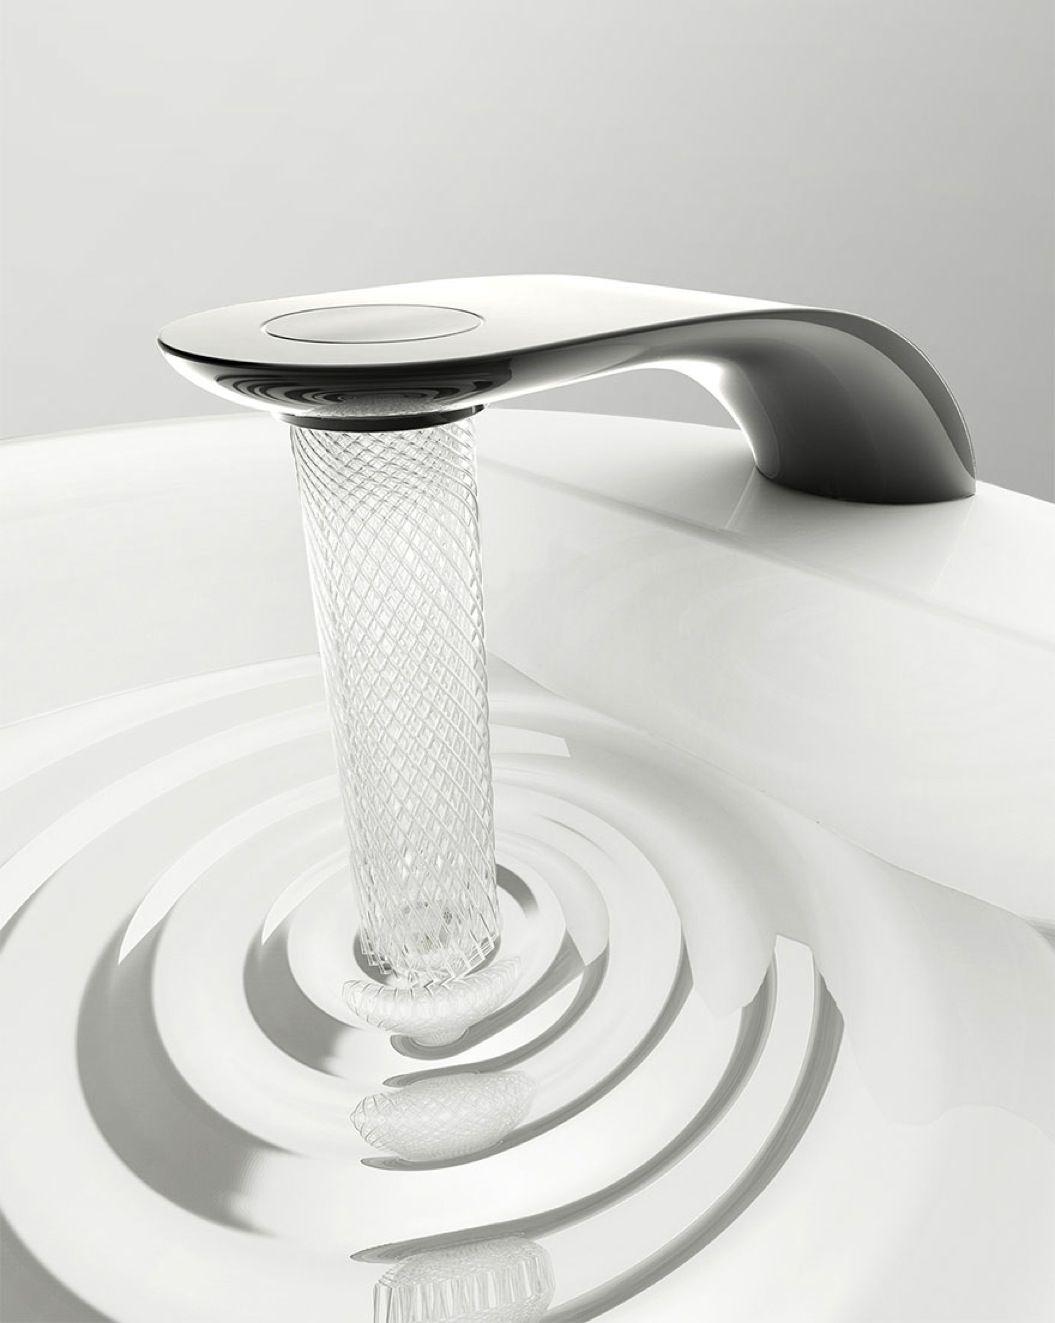 85singo_water-conservation-swirl-faucet-design-simin-qiu-5